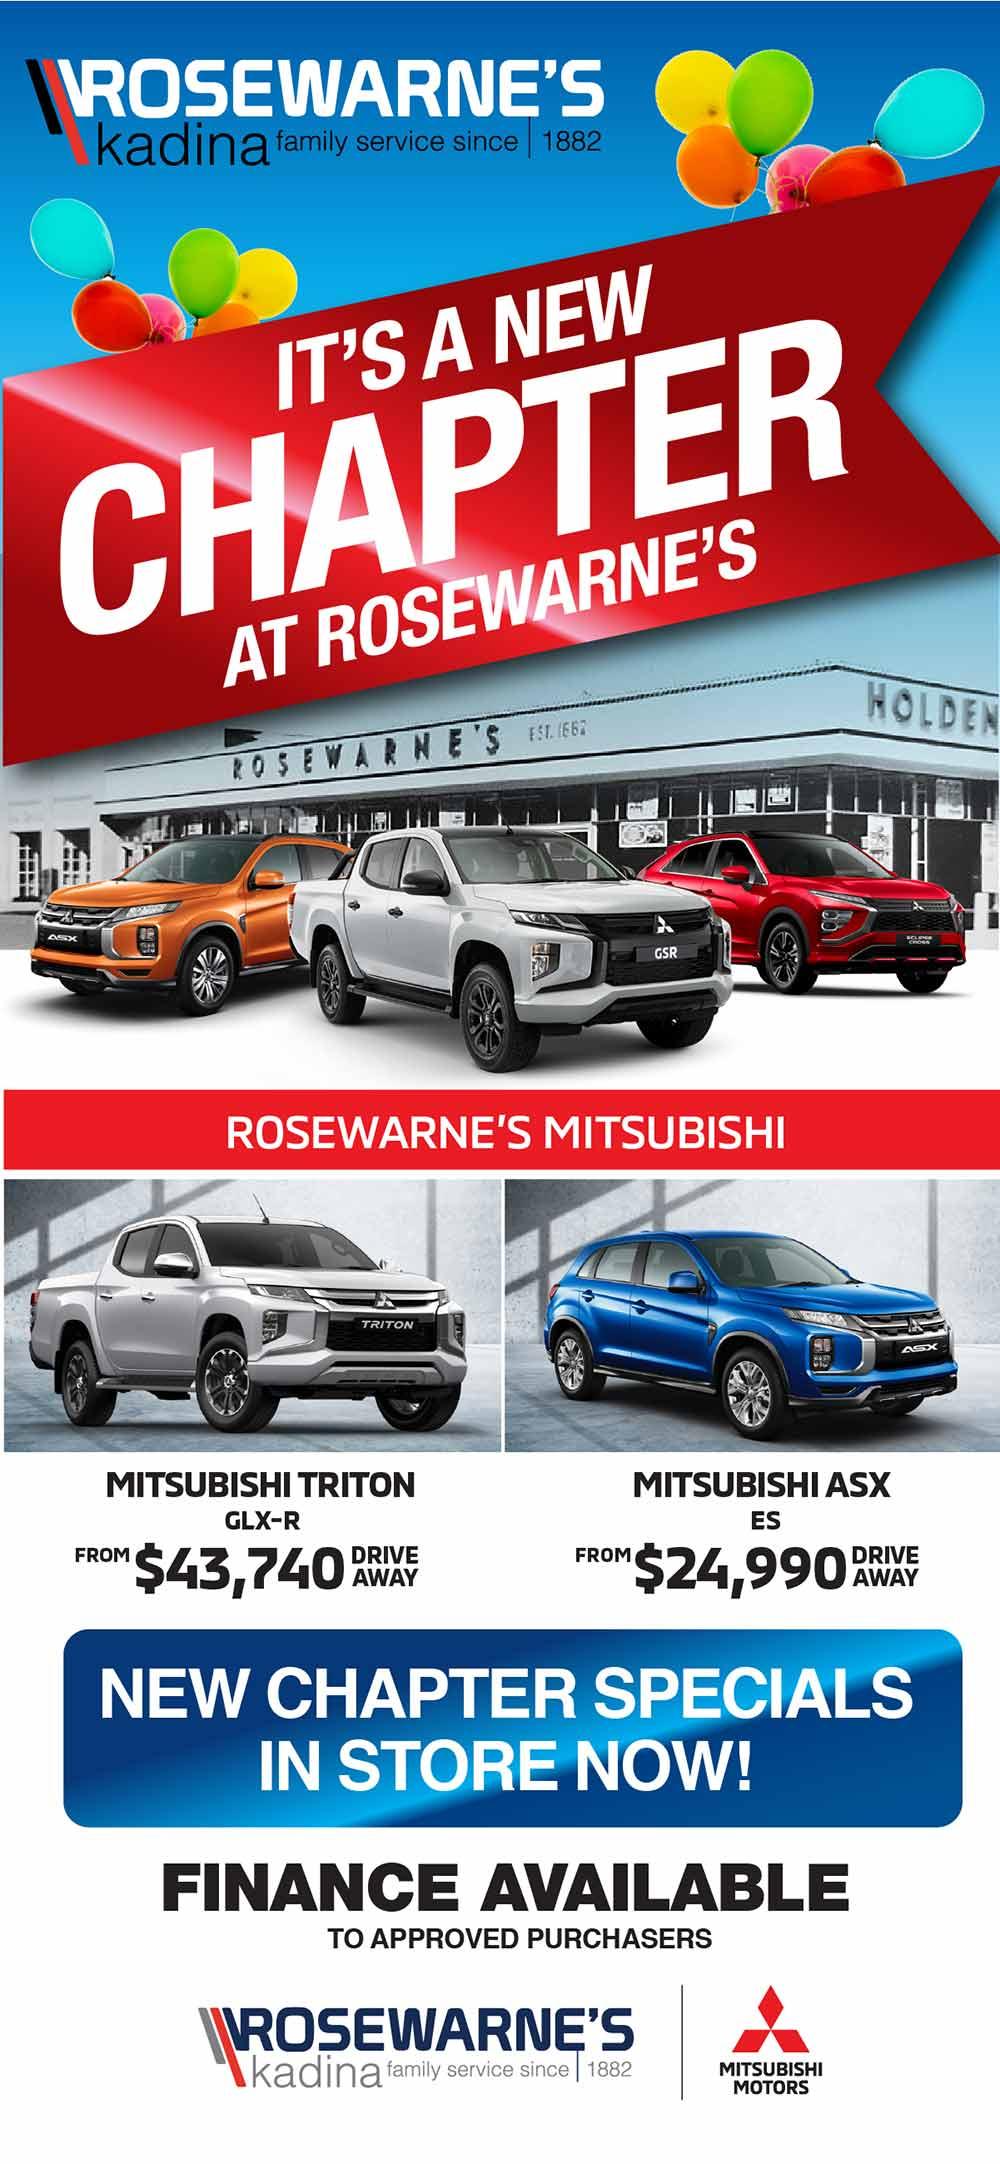 Rosewarnes Mitsubishi | It's A New Chapter At Rosewarnes Special